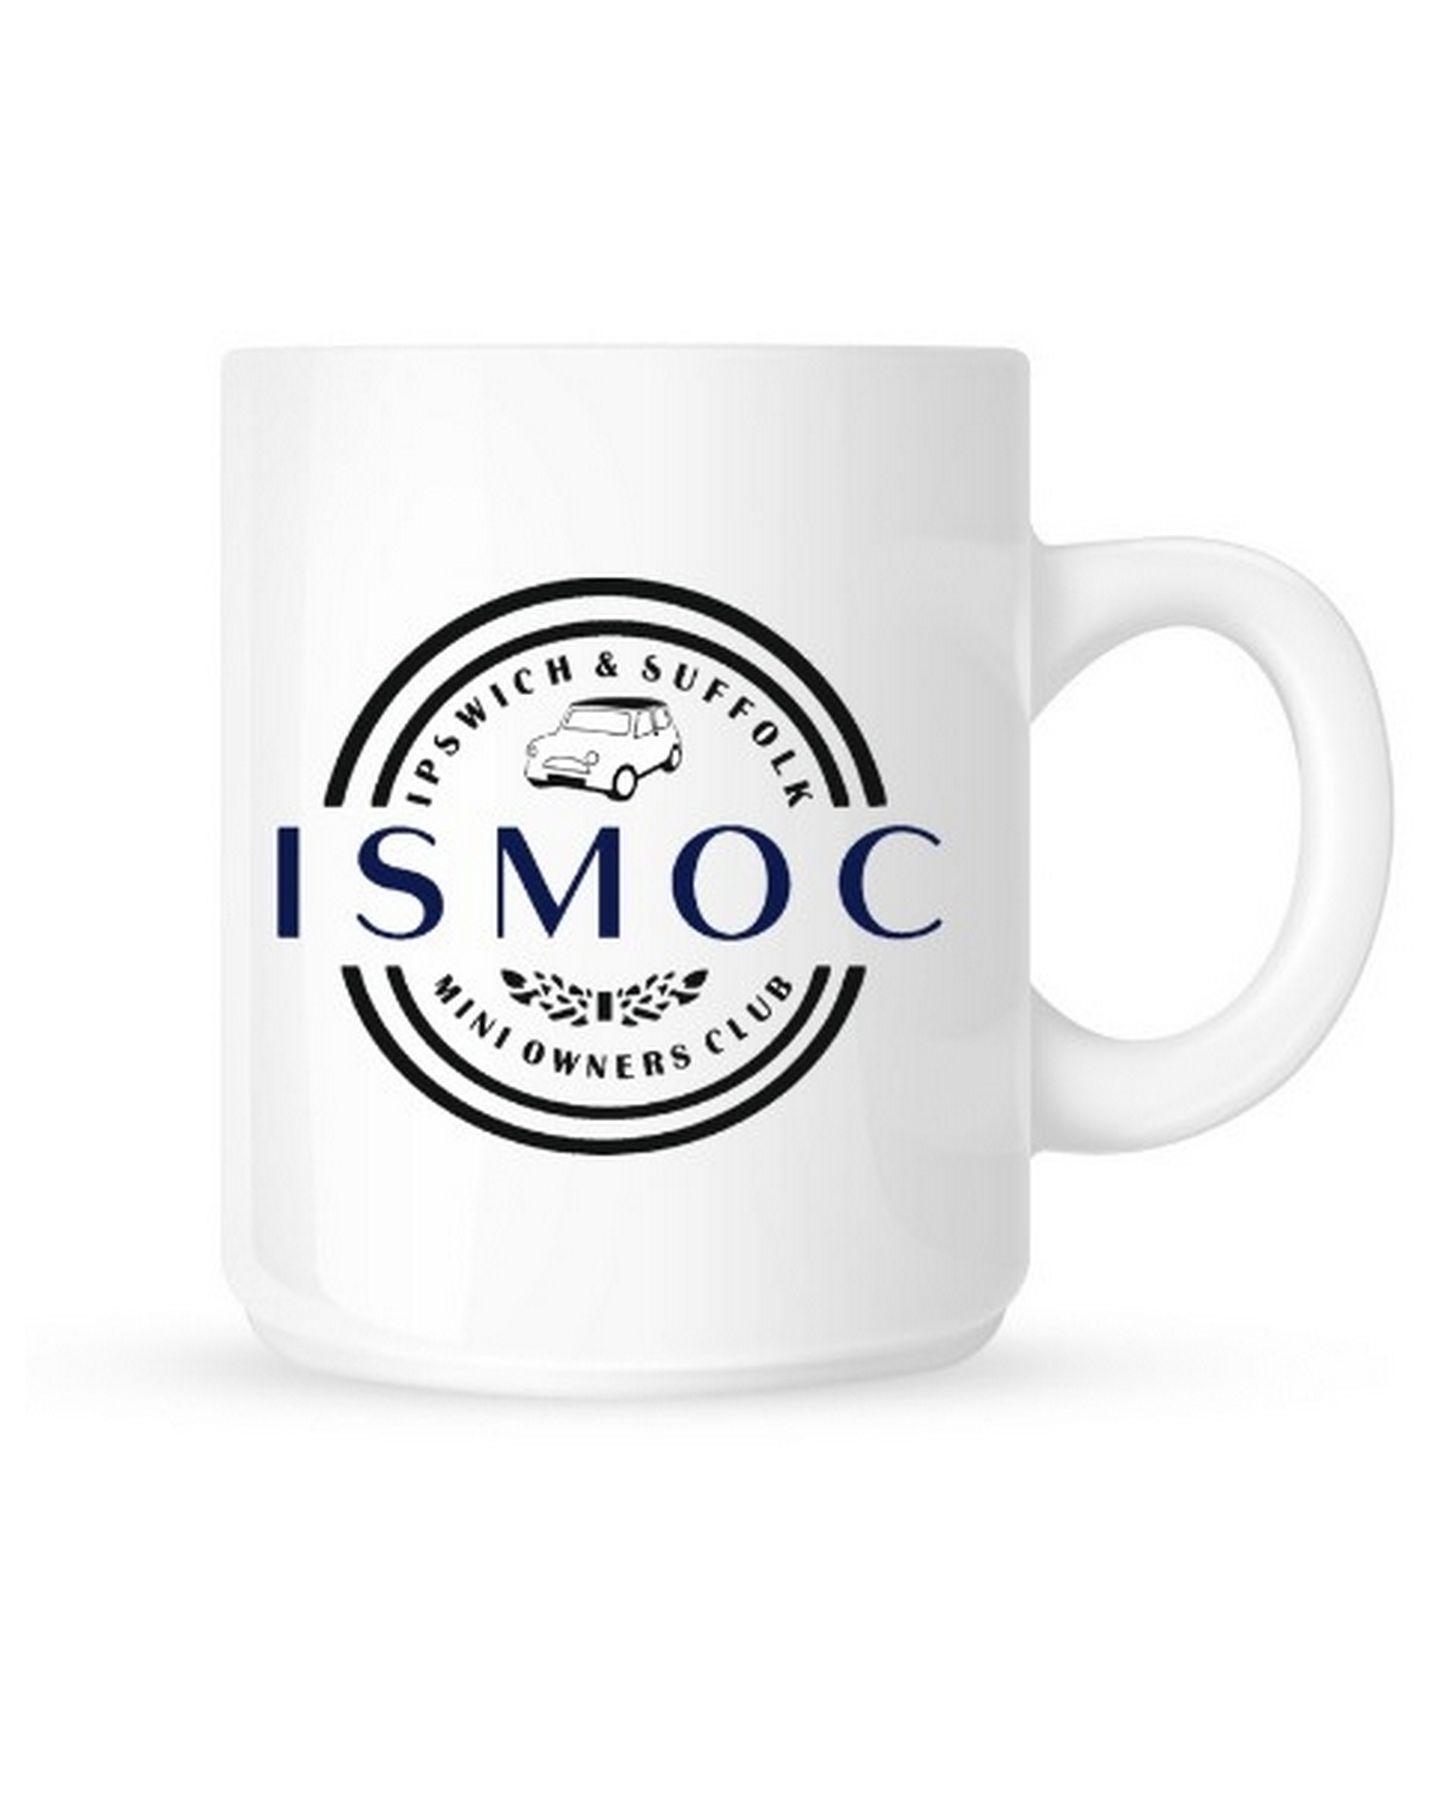 ISMOC – Mug